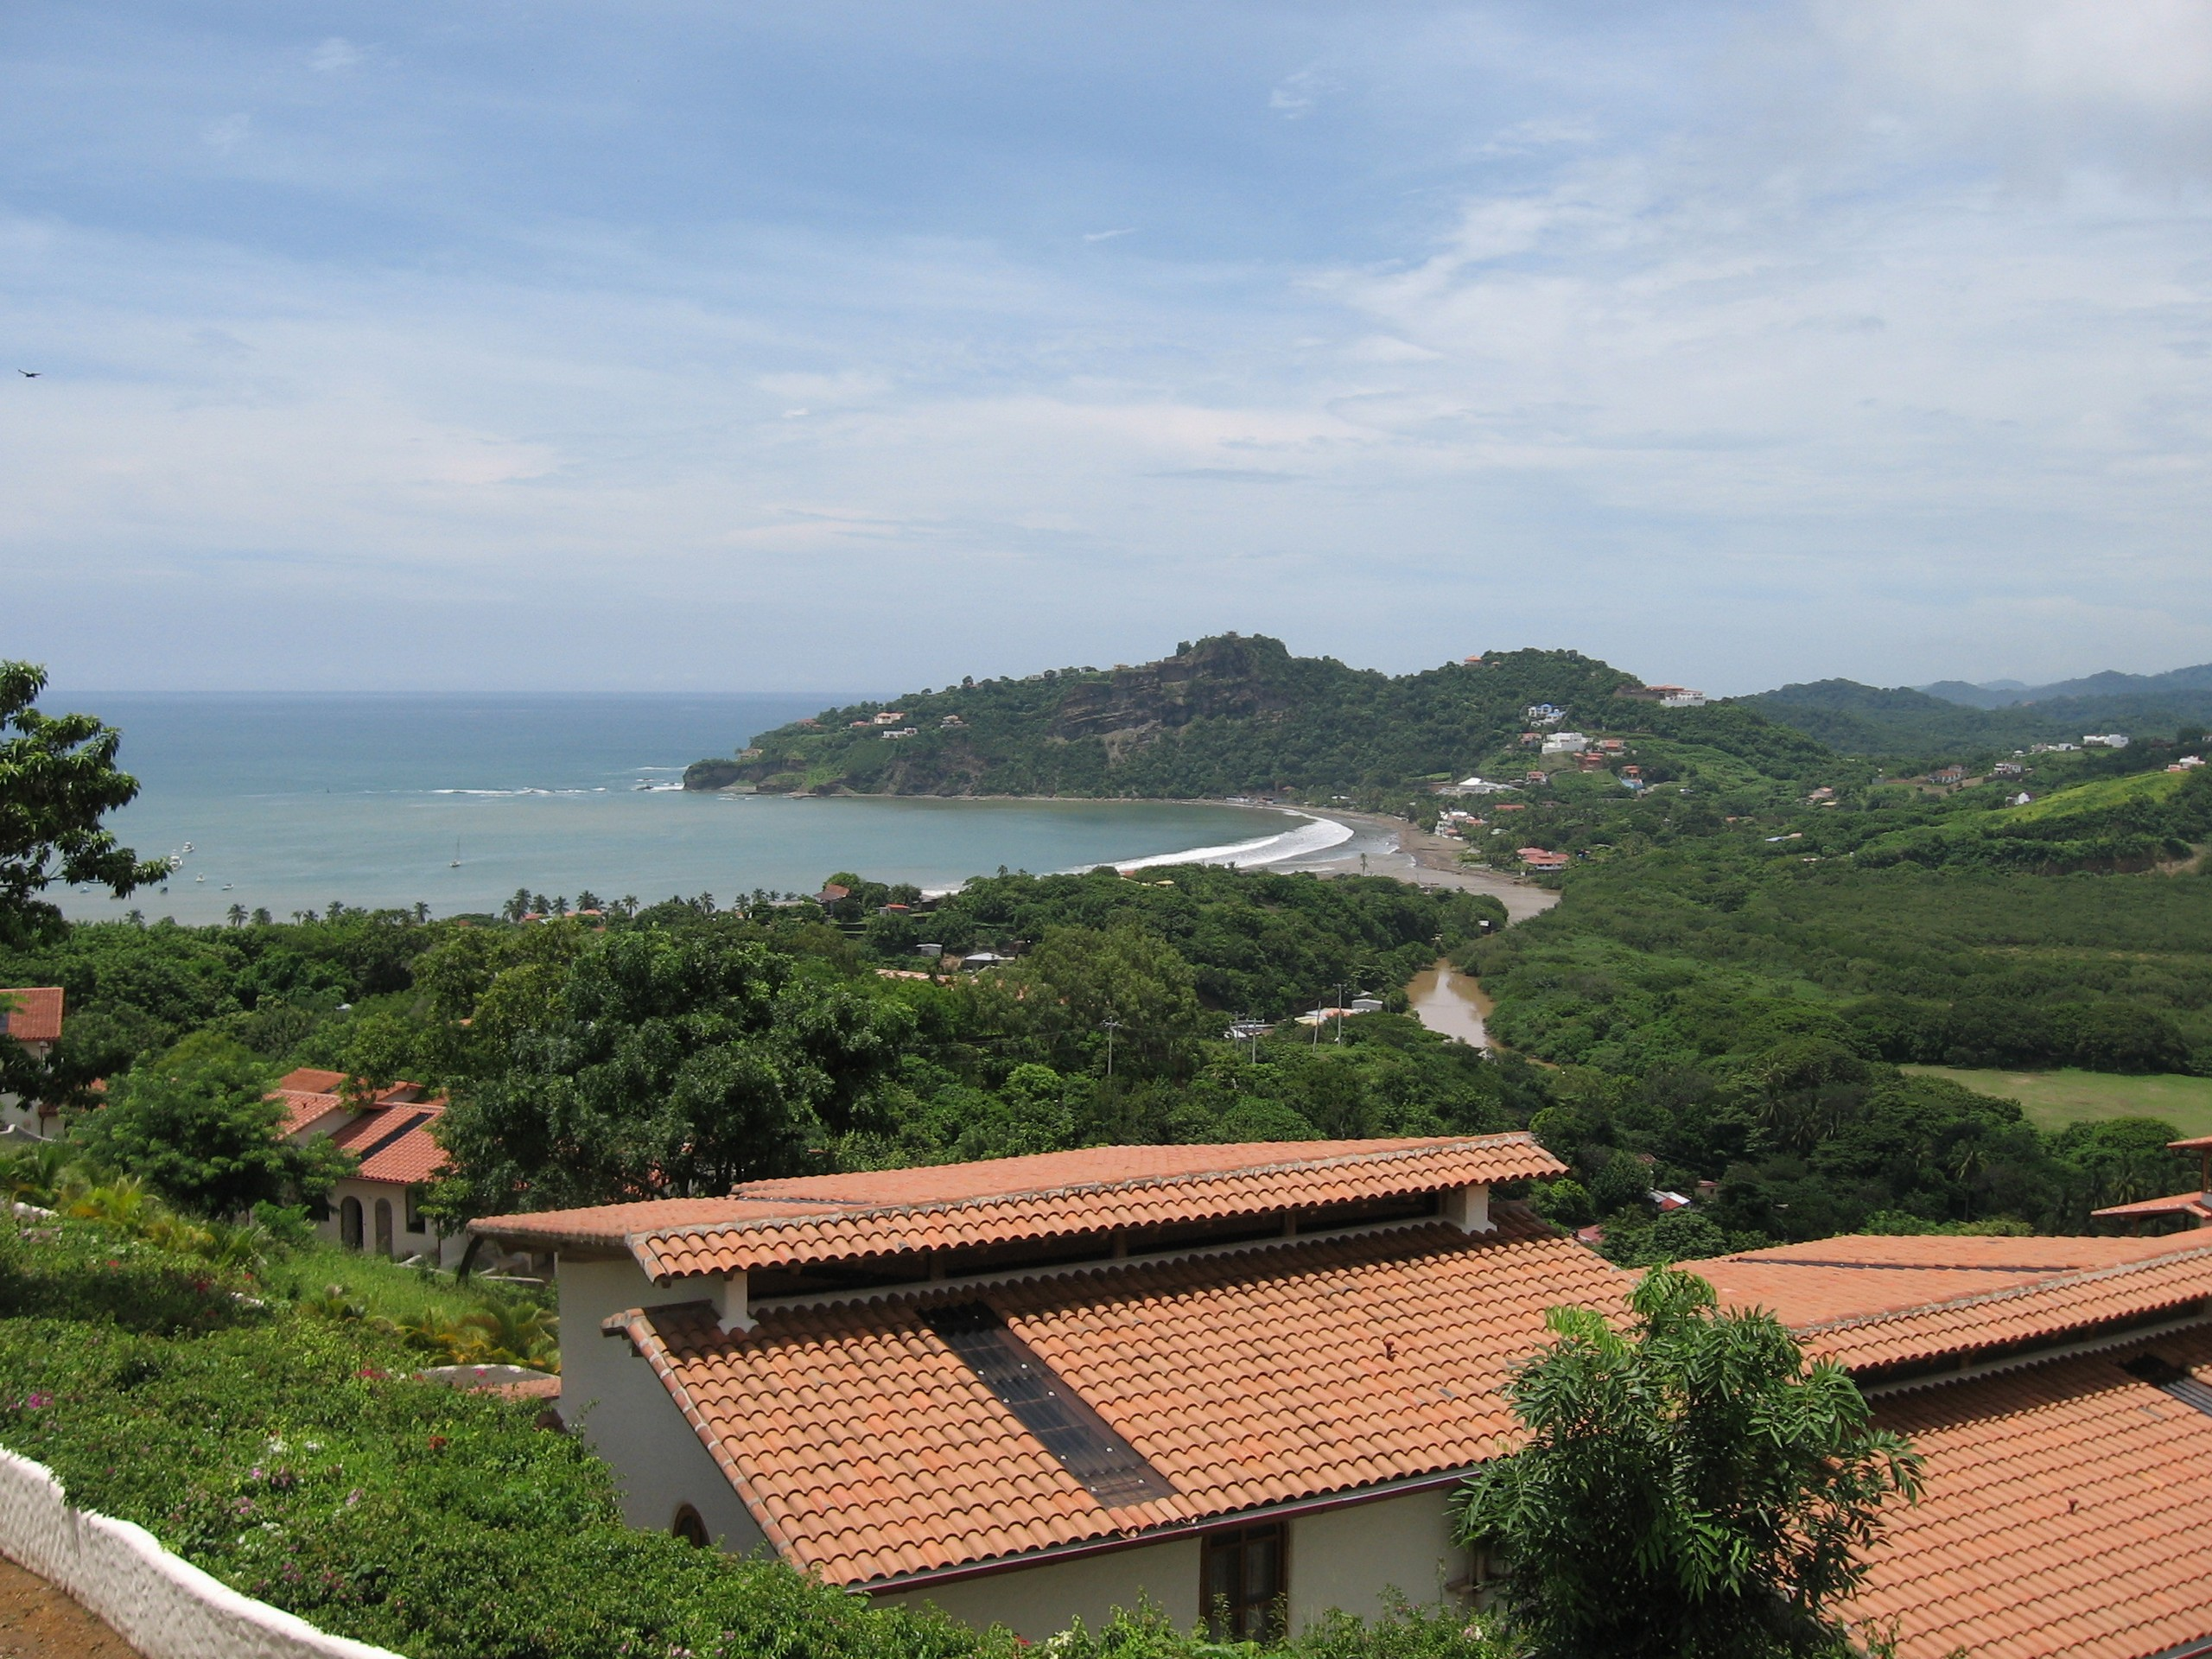 Views towards the beach in San Juan del Sur